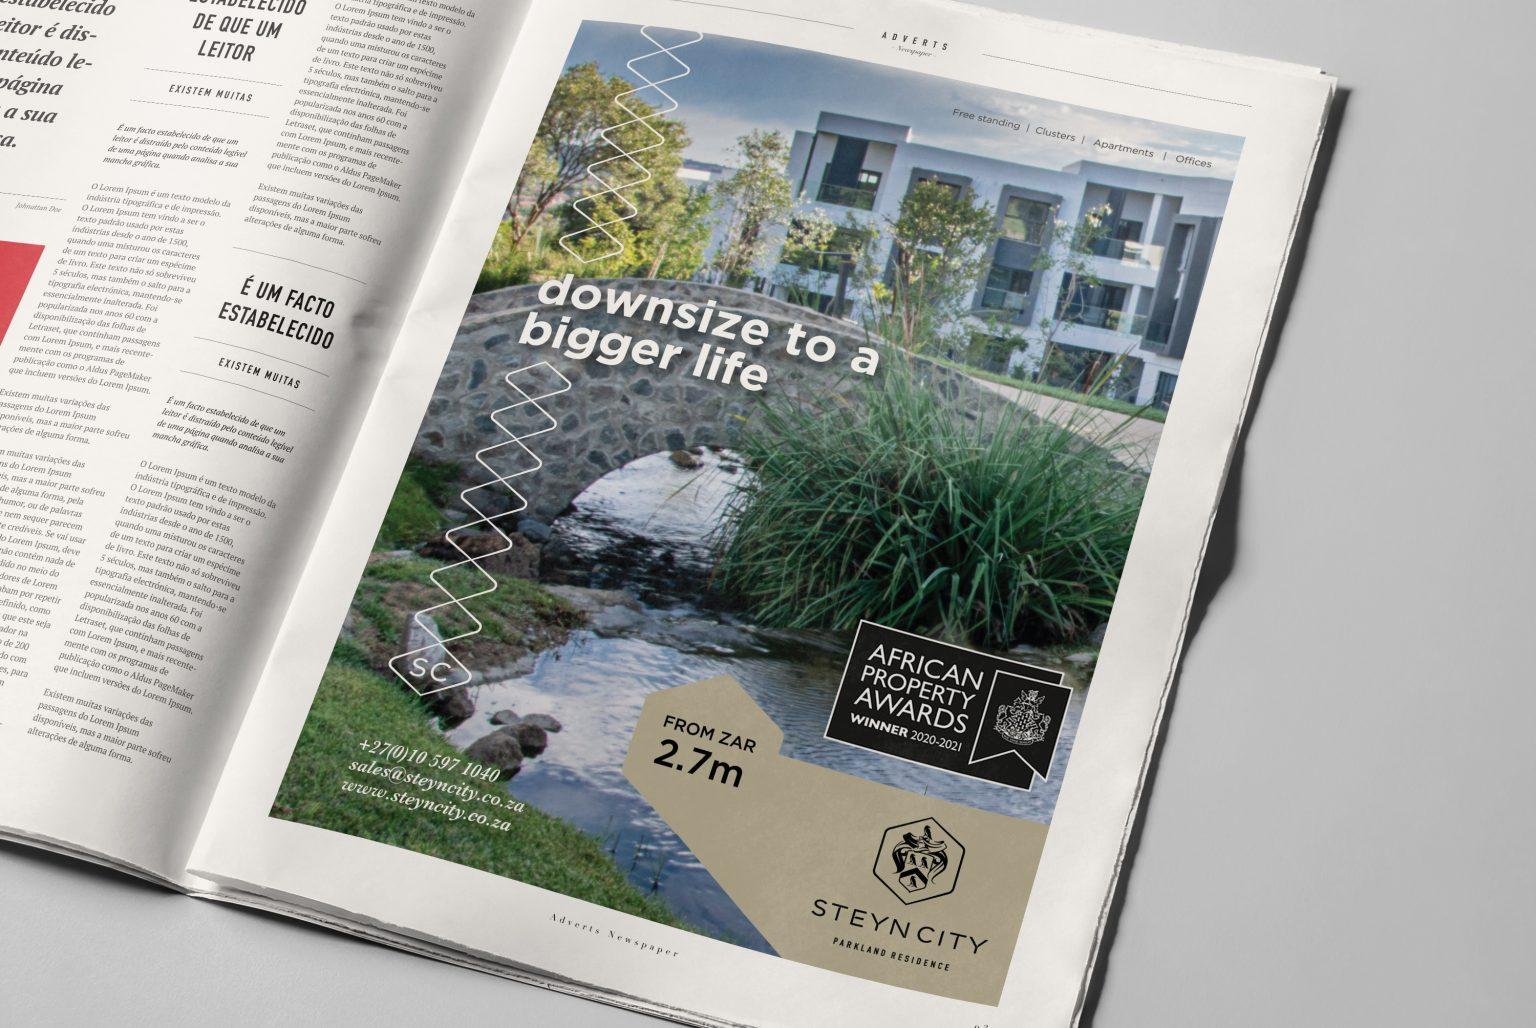 Amorphous digital agency_Design and web development_Steyn City